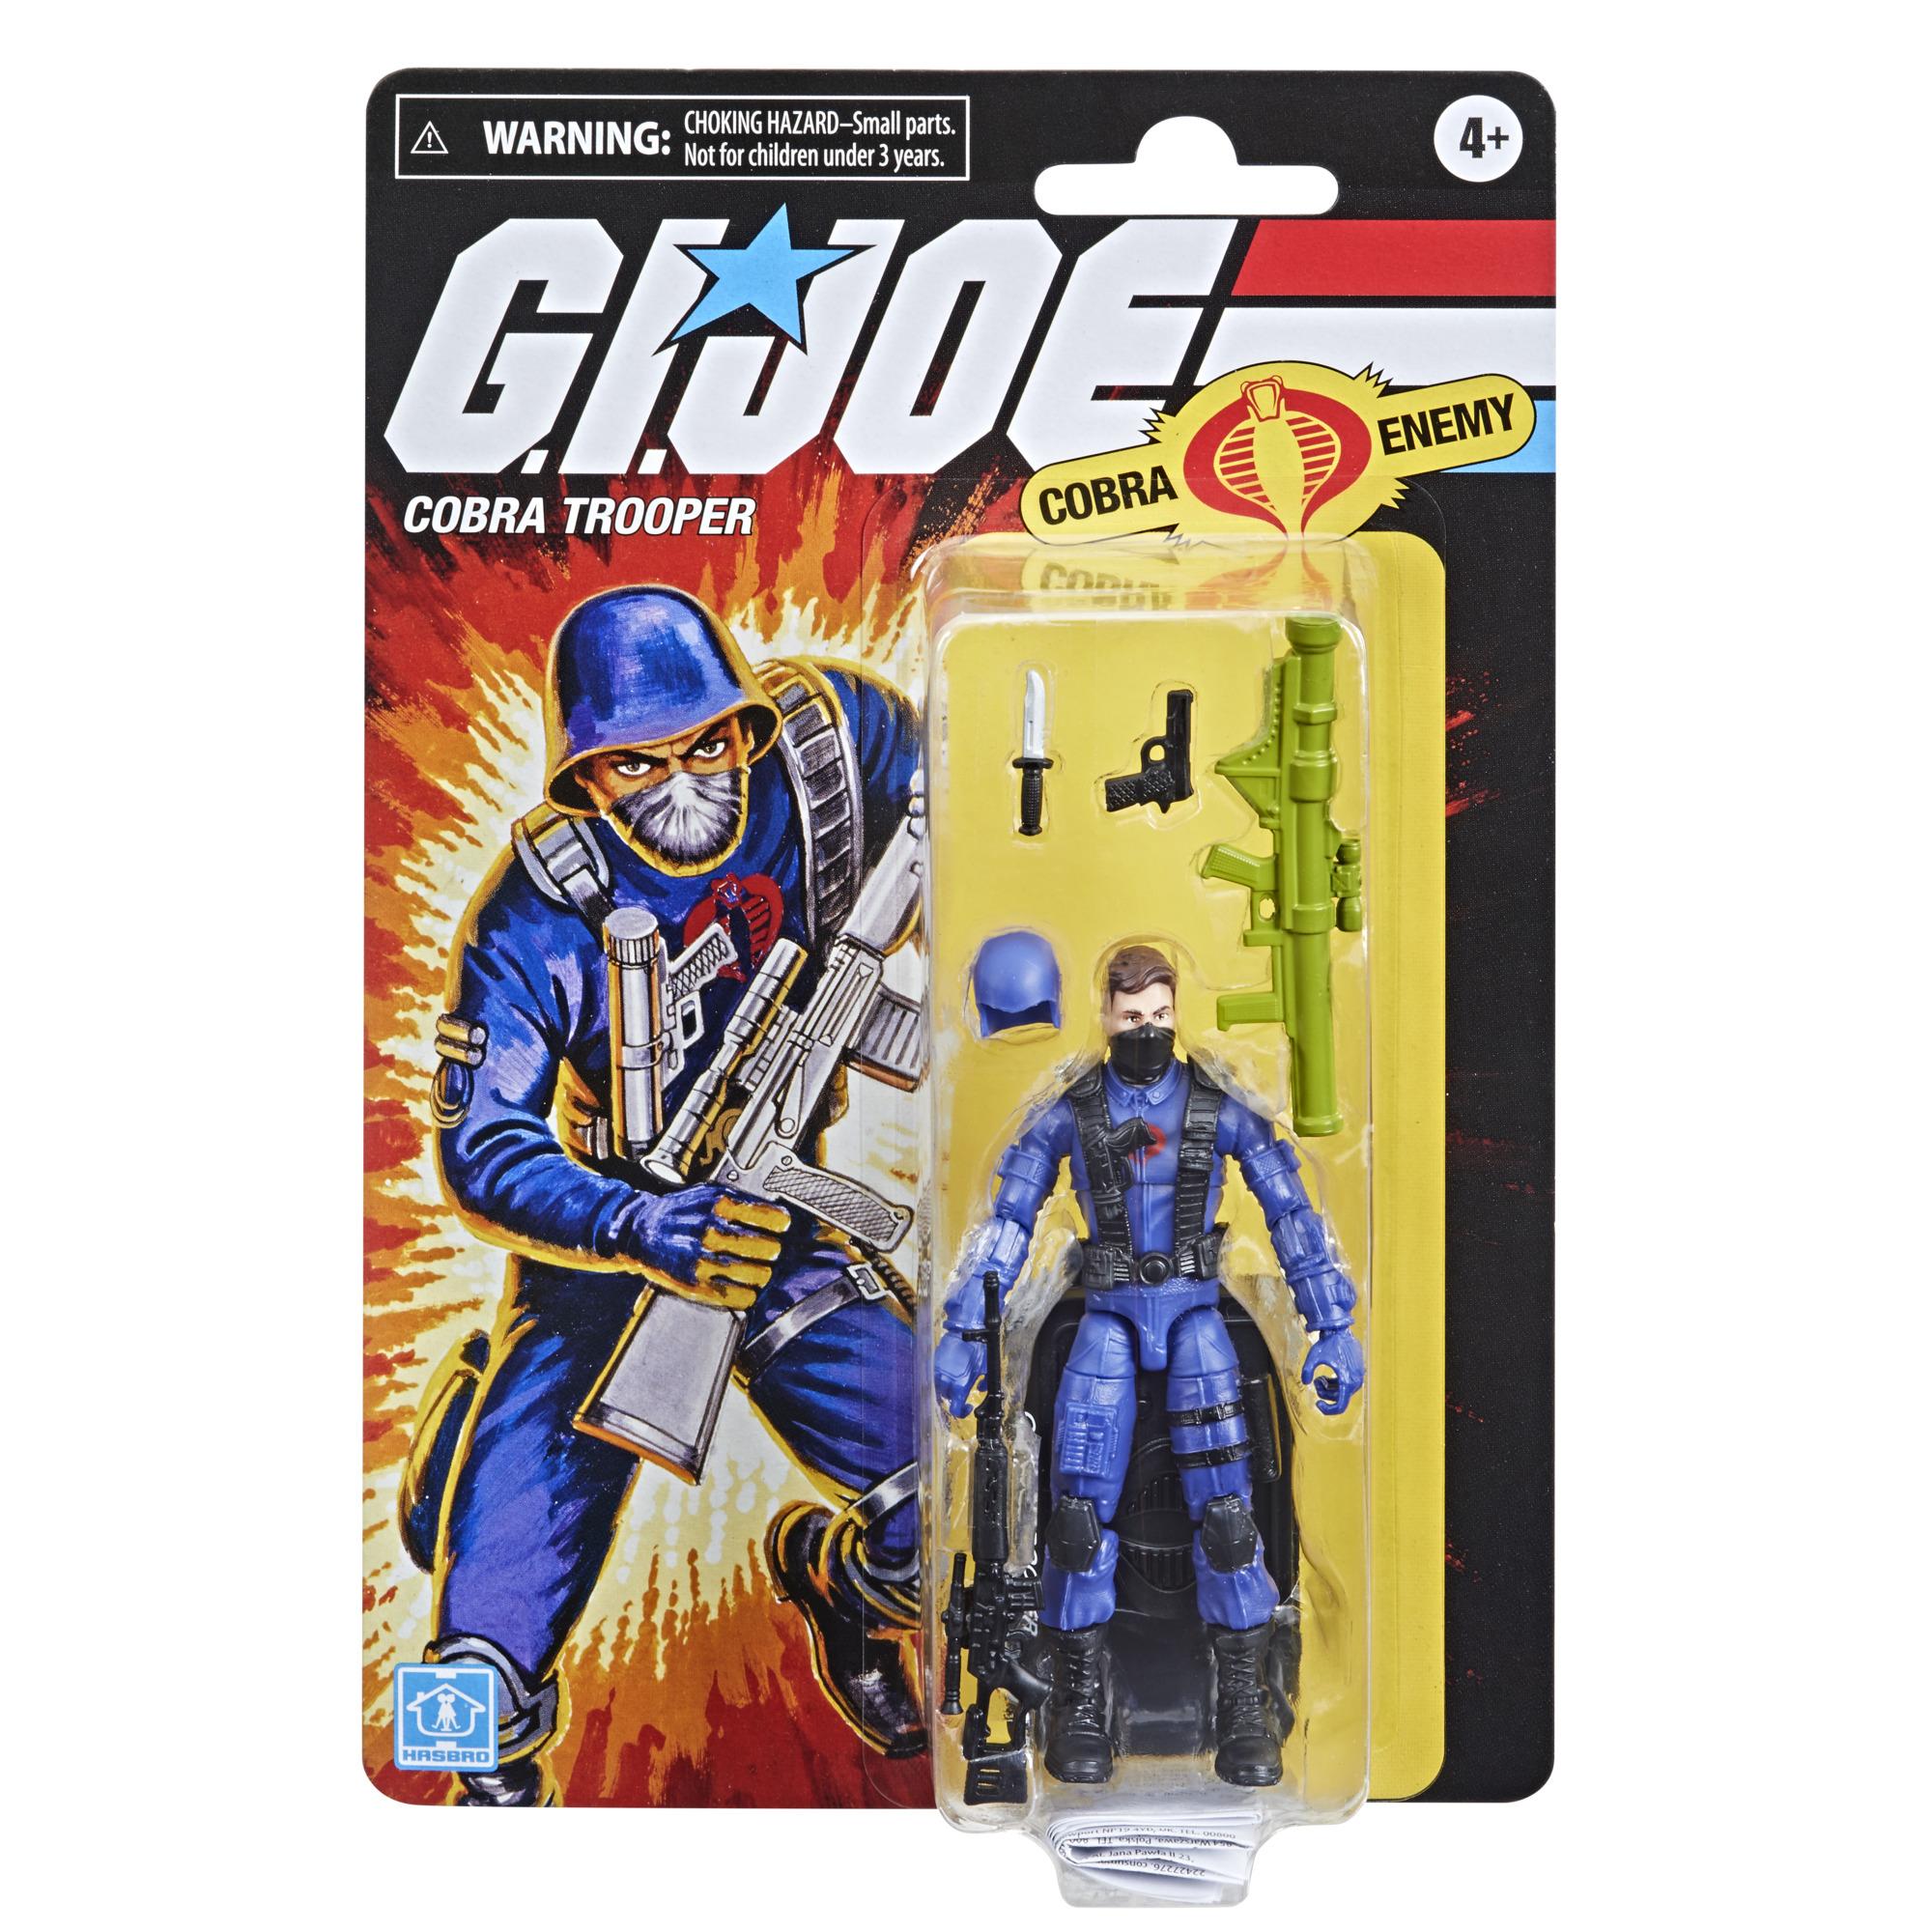 G.I. Joe RETRO Series Action Figure Cobra Trooper 9,5 cm  F27265L00  5010993852734